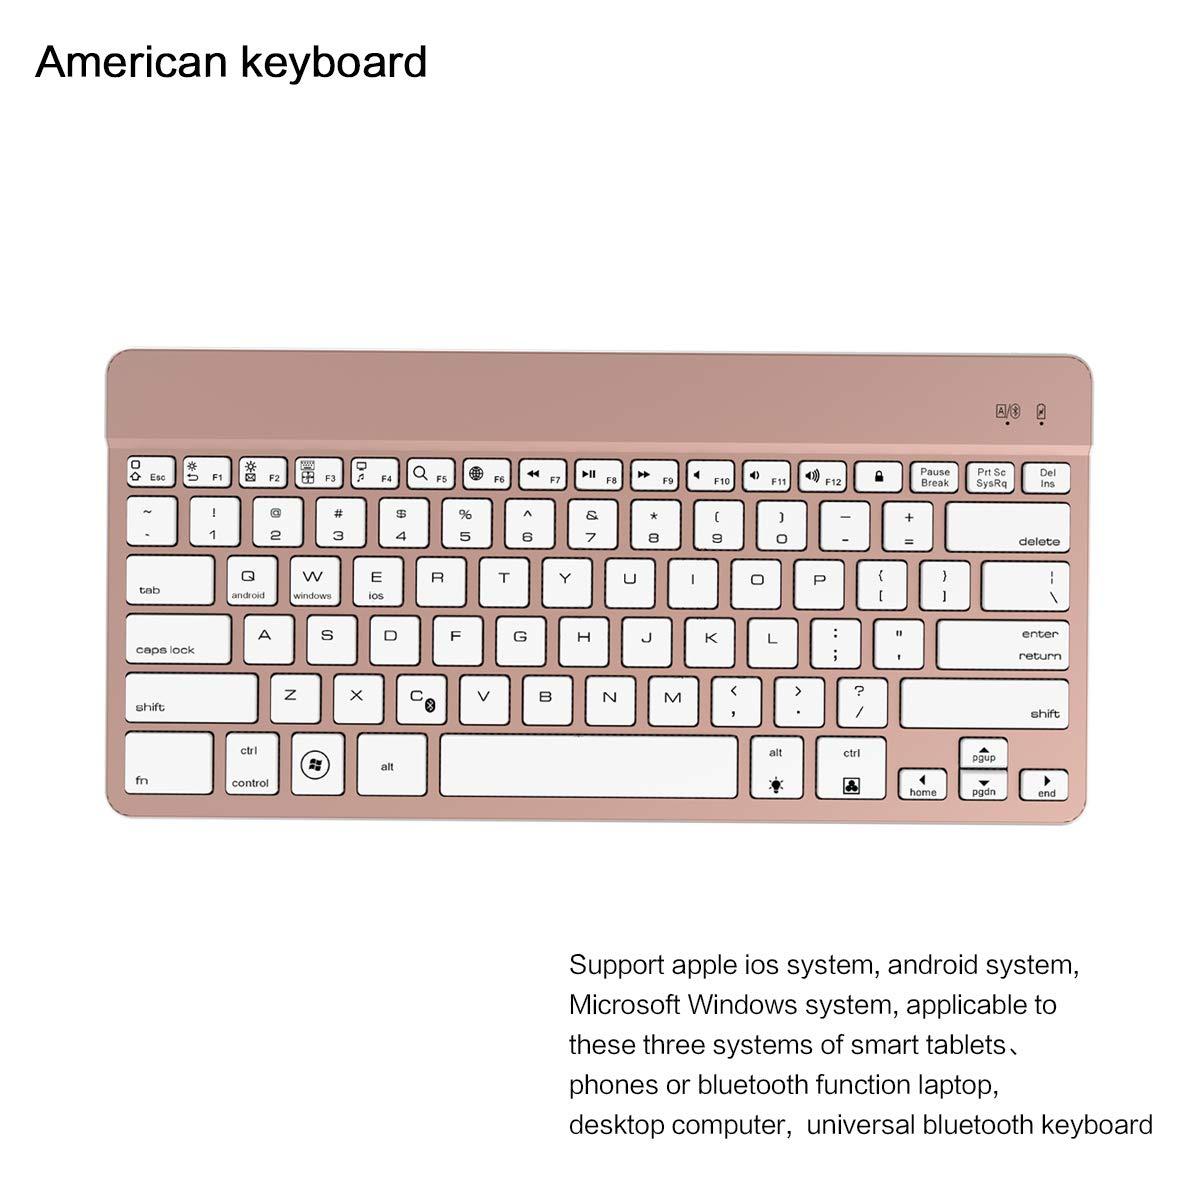 microsoft wireless keyboard support